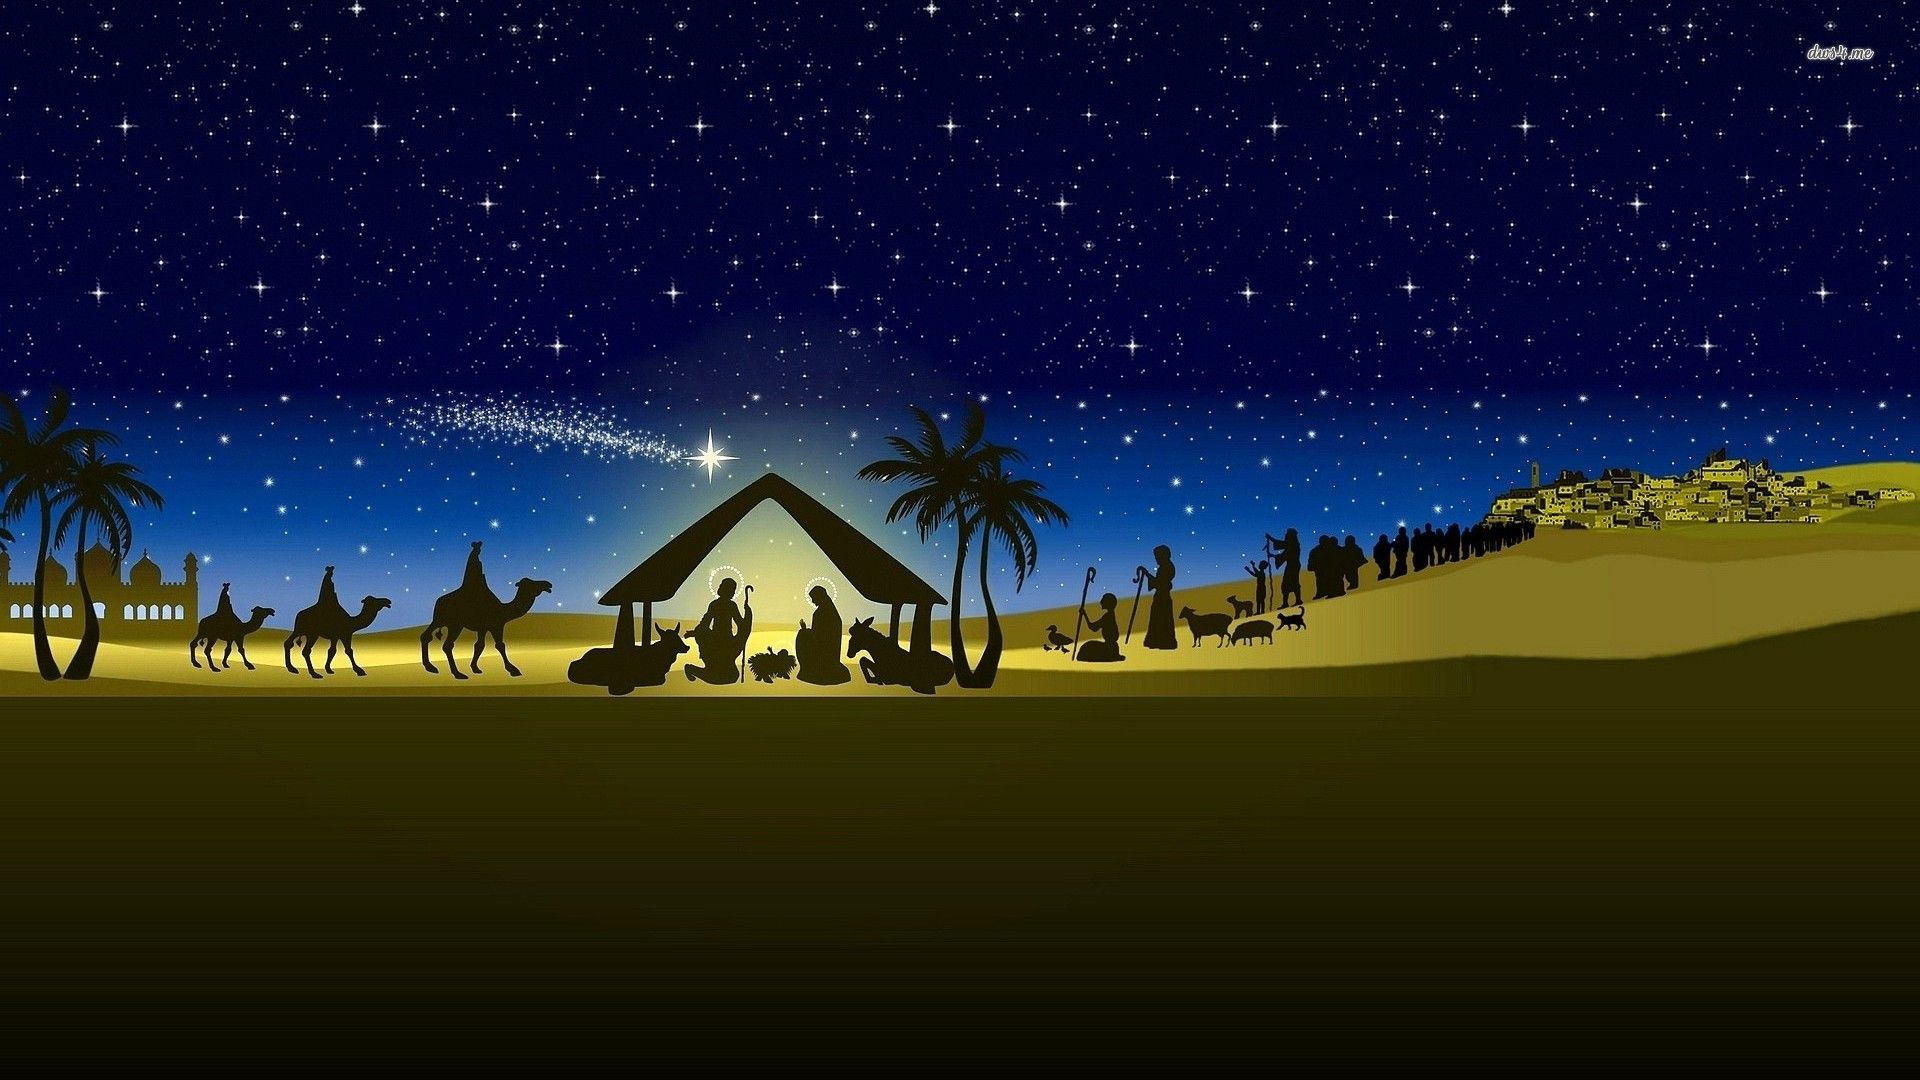 Christian Christmas Nativity Wallpapers Top Free Christian